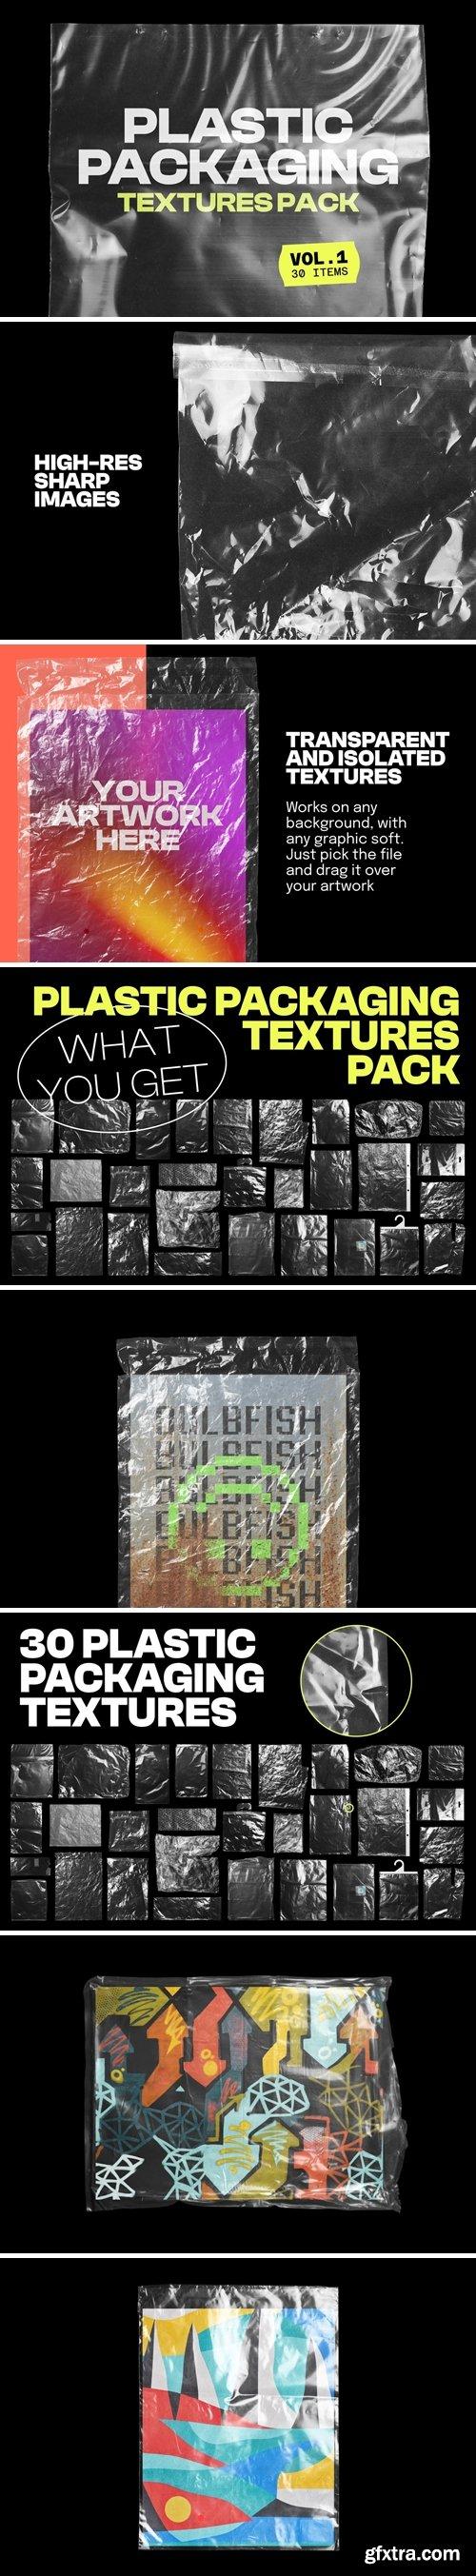 Plastic Packaging Vol.1 - 30 Textures Pack